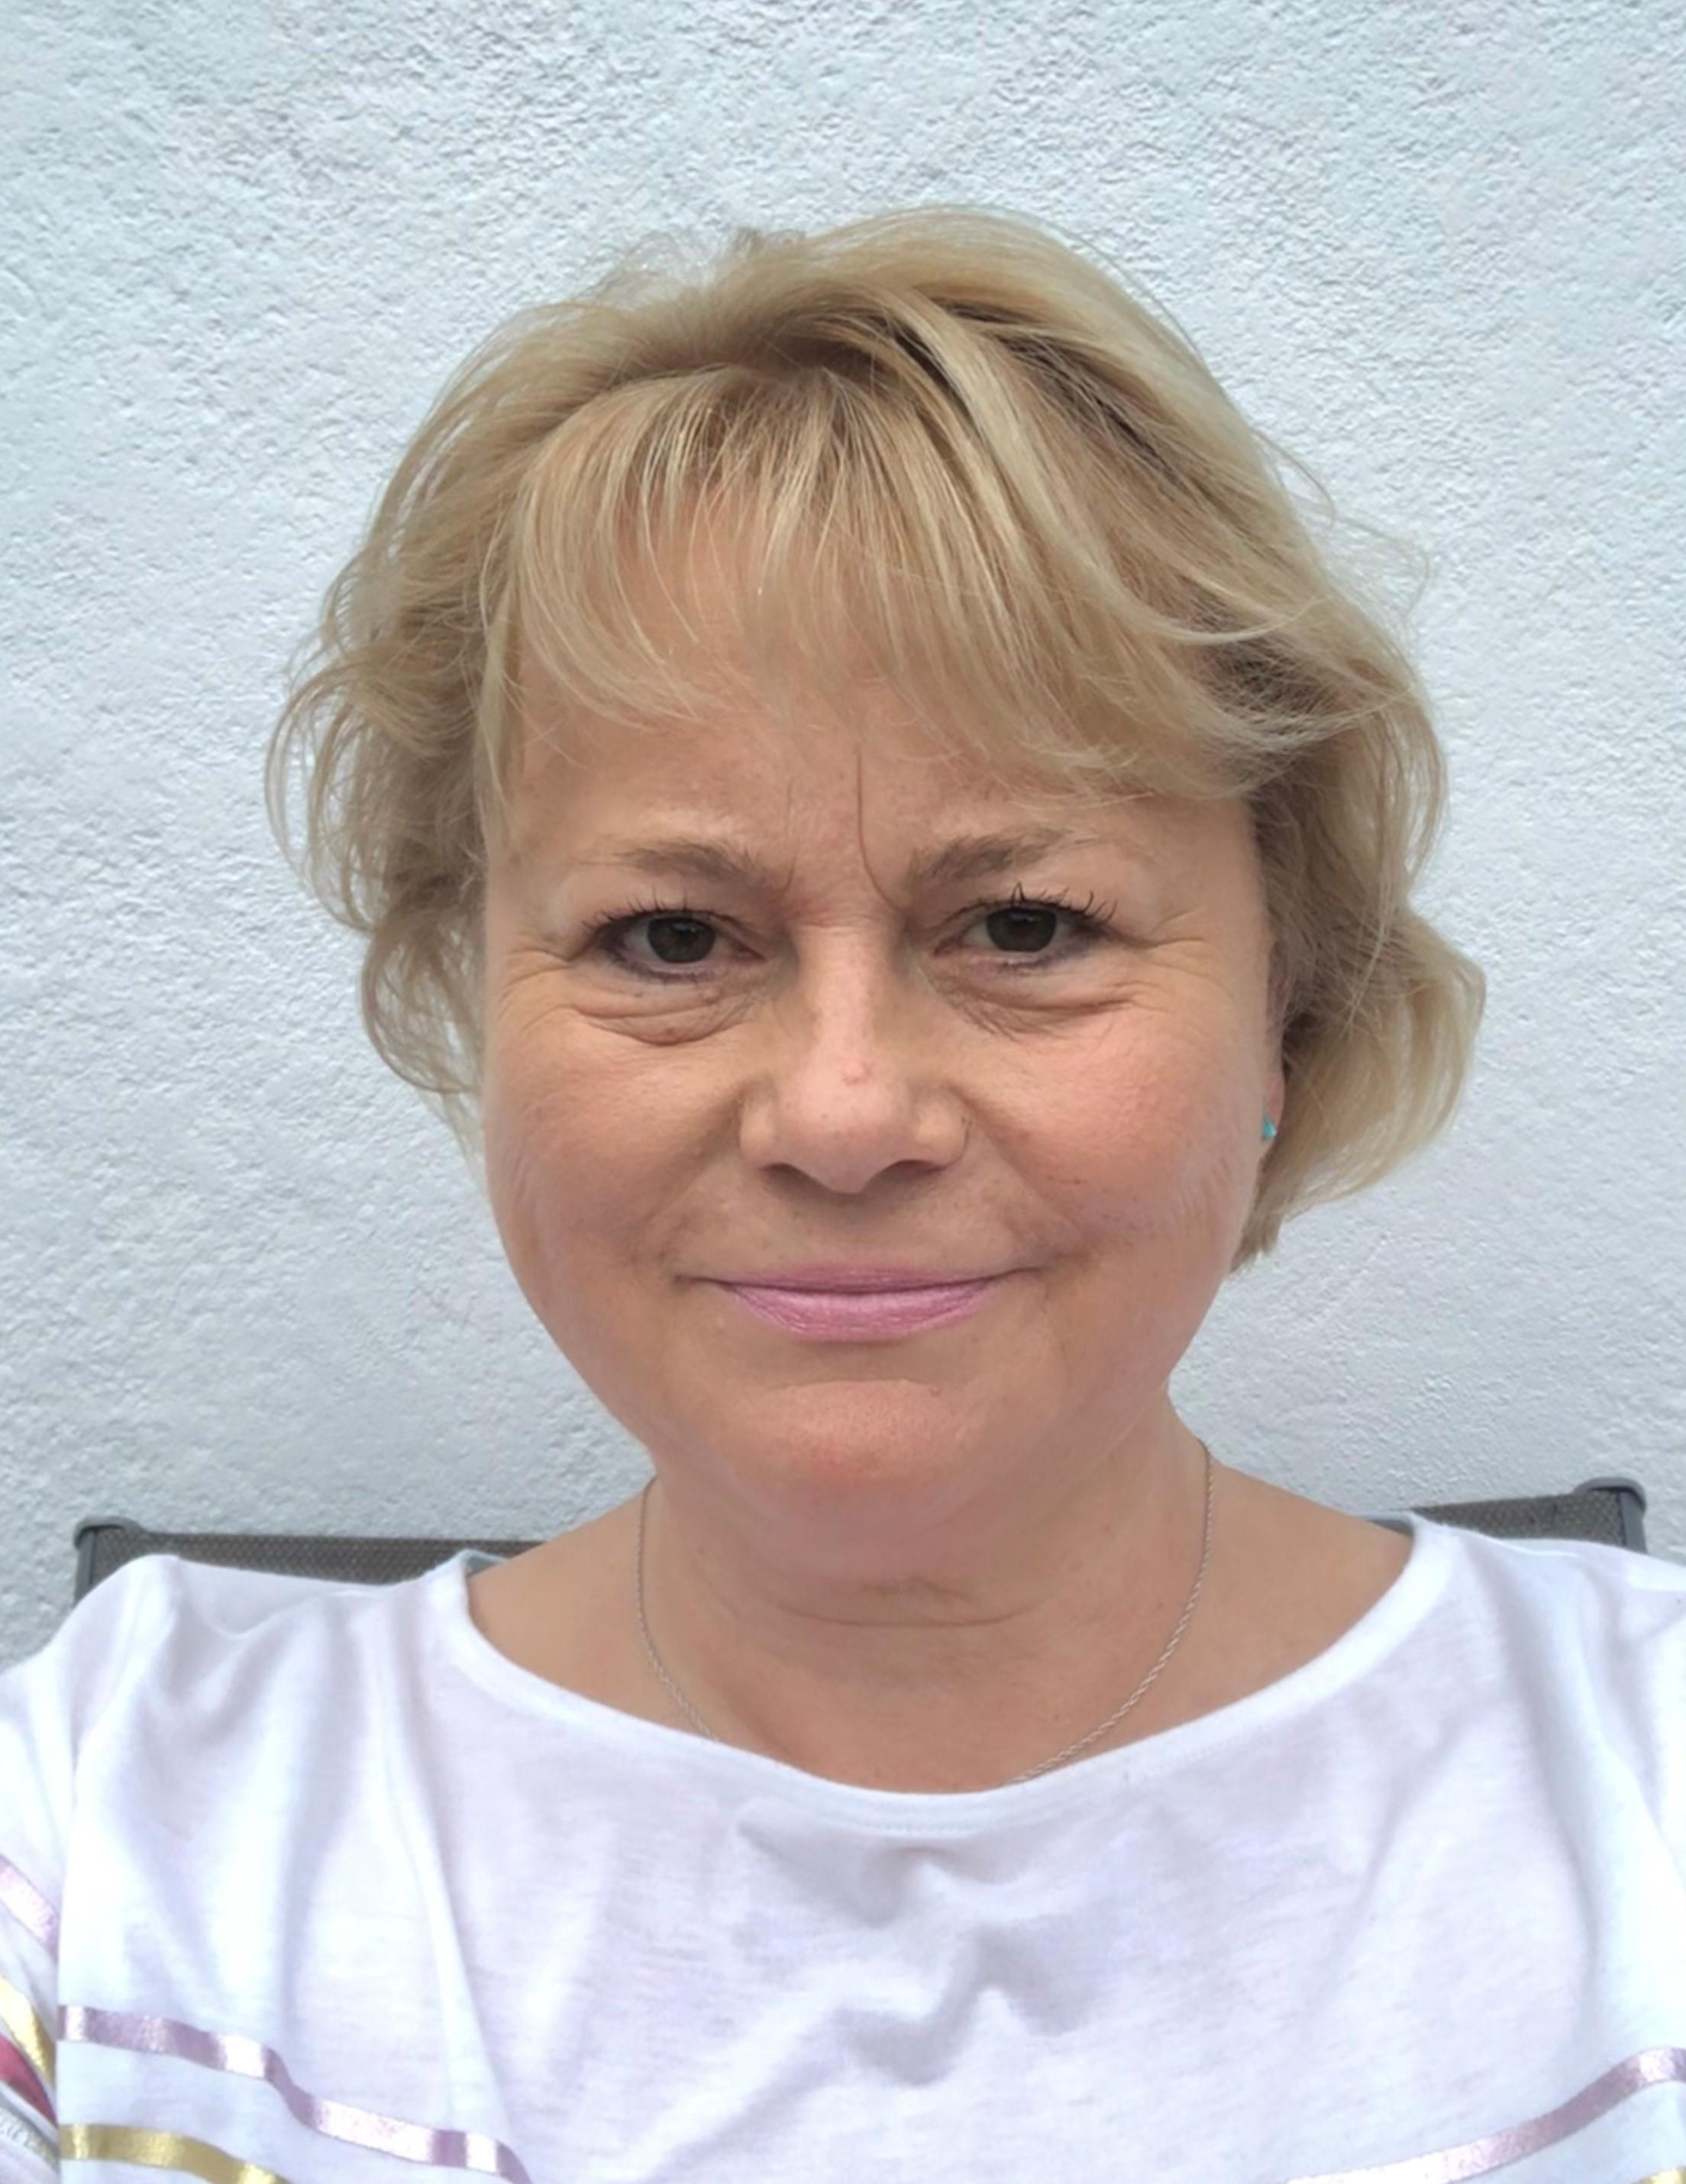 Nicola Engel-Khan